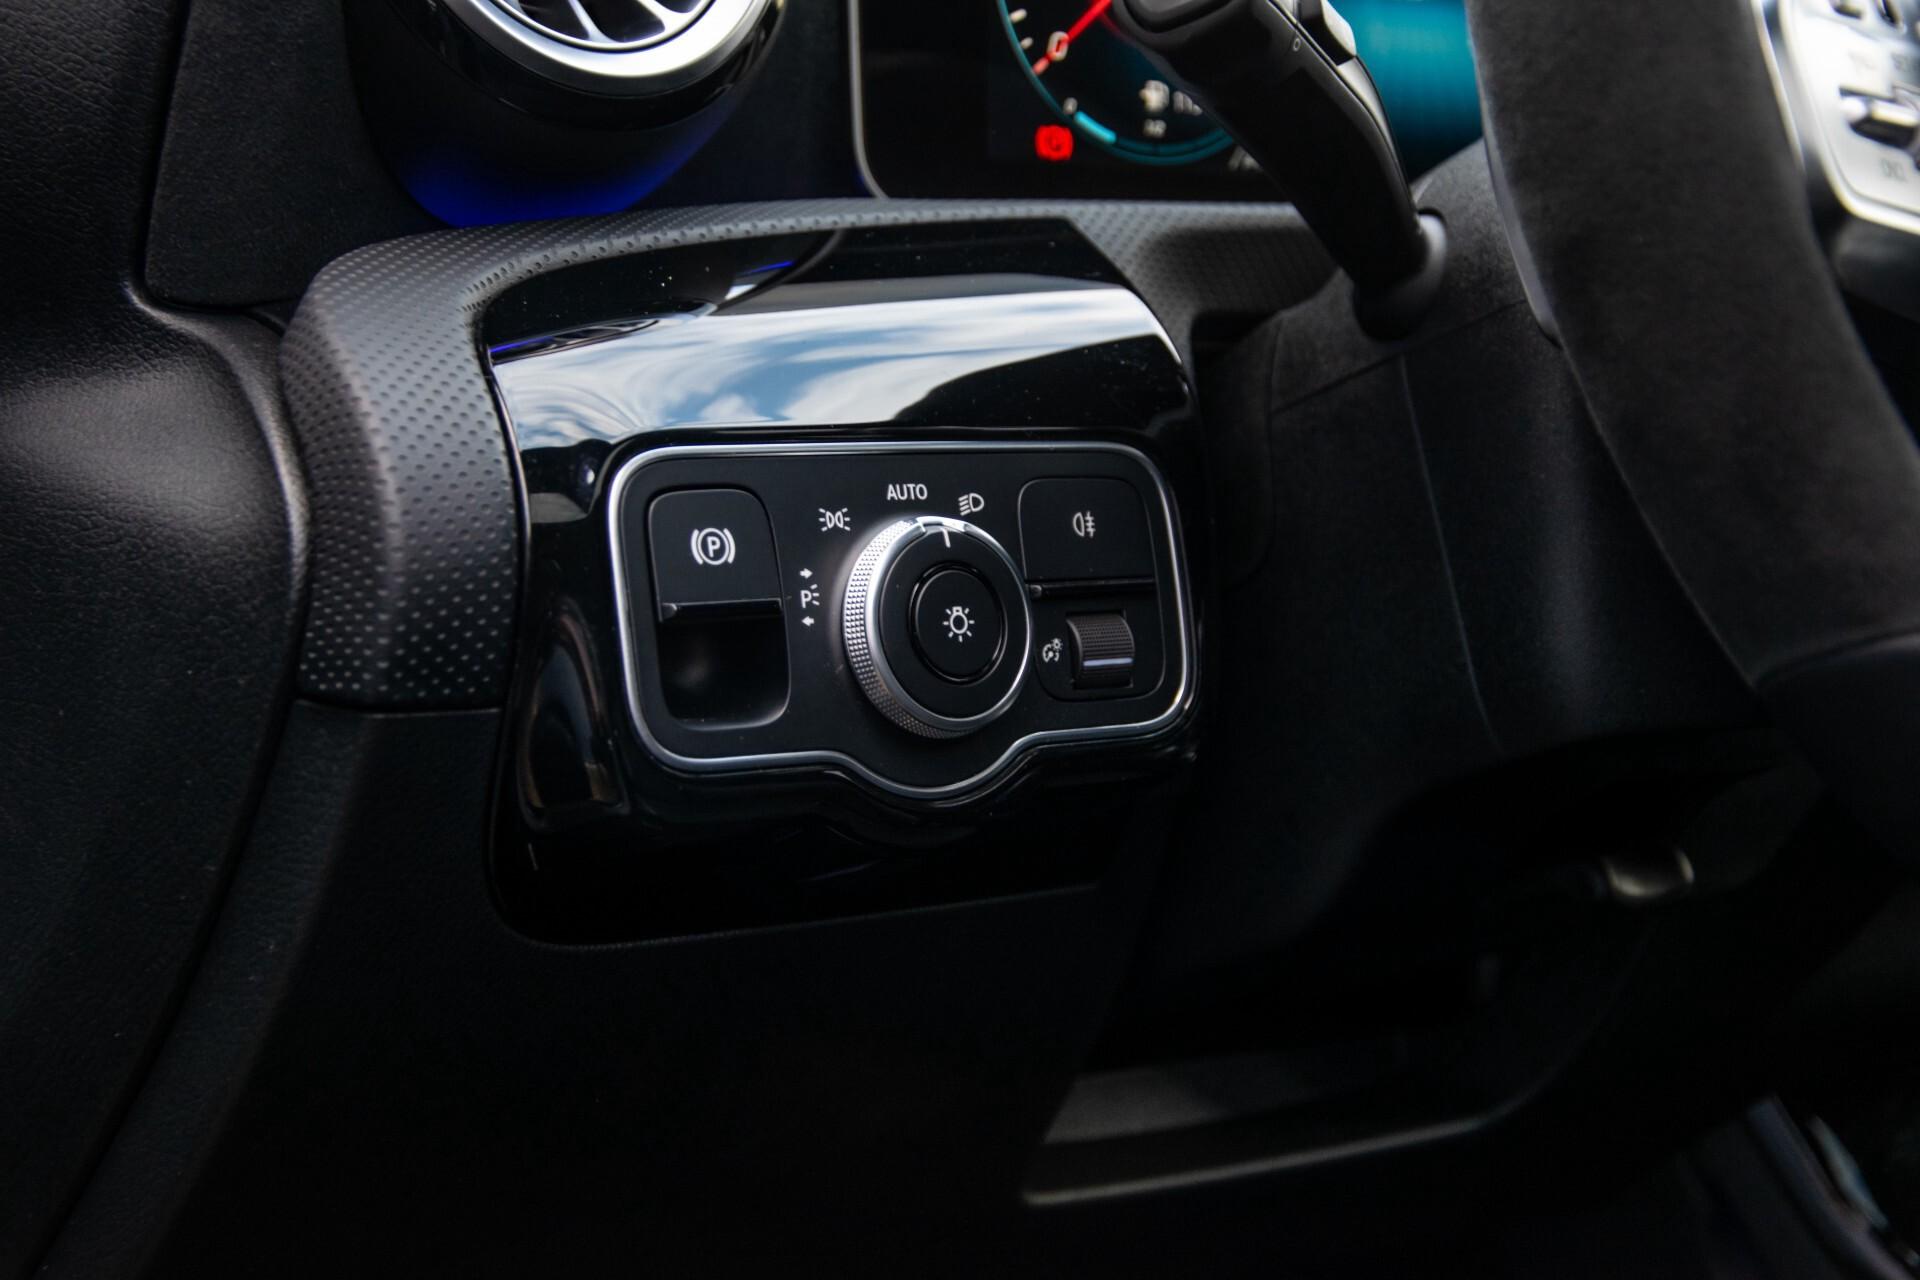 Mercedes-Benz A-Klasse 250 4-M AMG Panorama/Keyless-Entry/MBUX/HUD/Burmester/360/Multibeam LED Aut7 Foto 41